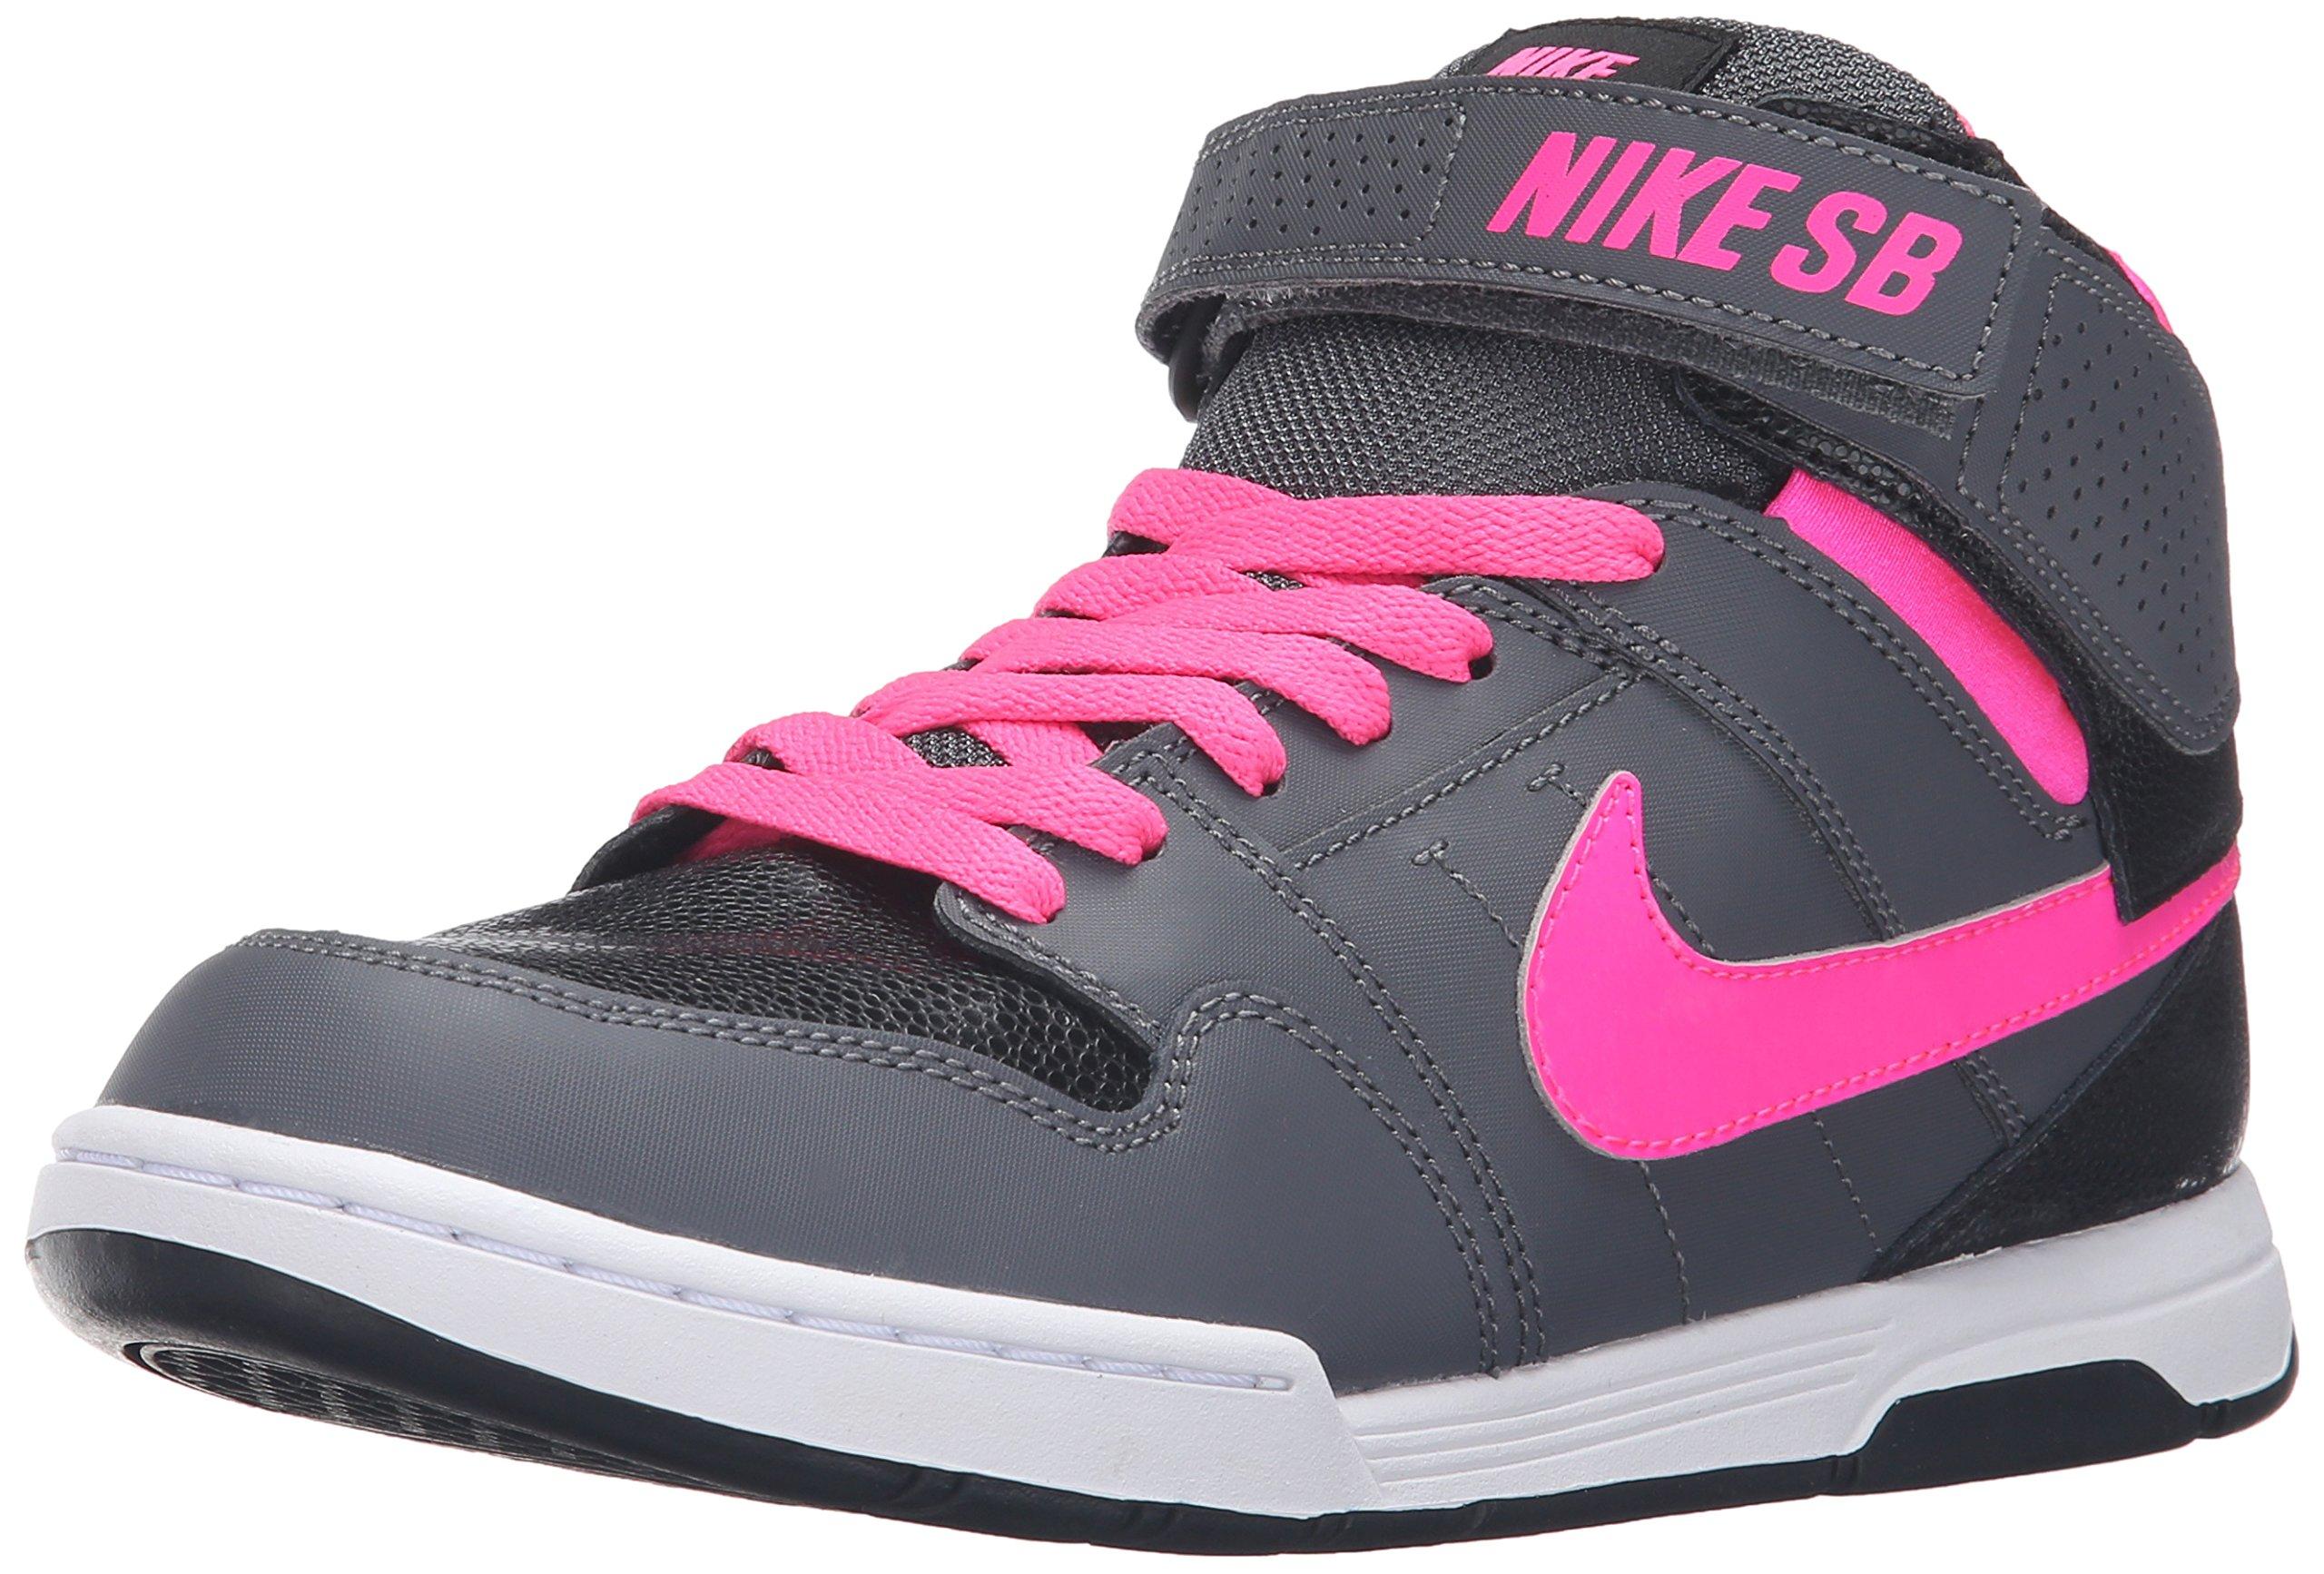 NIKE Boys' Mogan Mid 2 JR Skateboarding Sneaker, Dark Grey/Pink Blast/Black/White, 3.5 M US Big Kid by NIKE